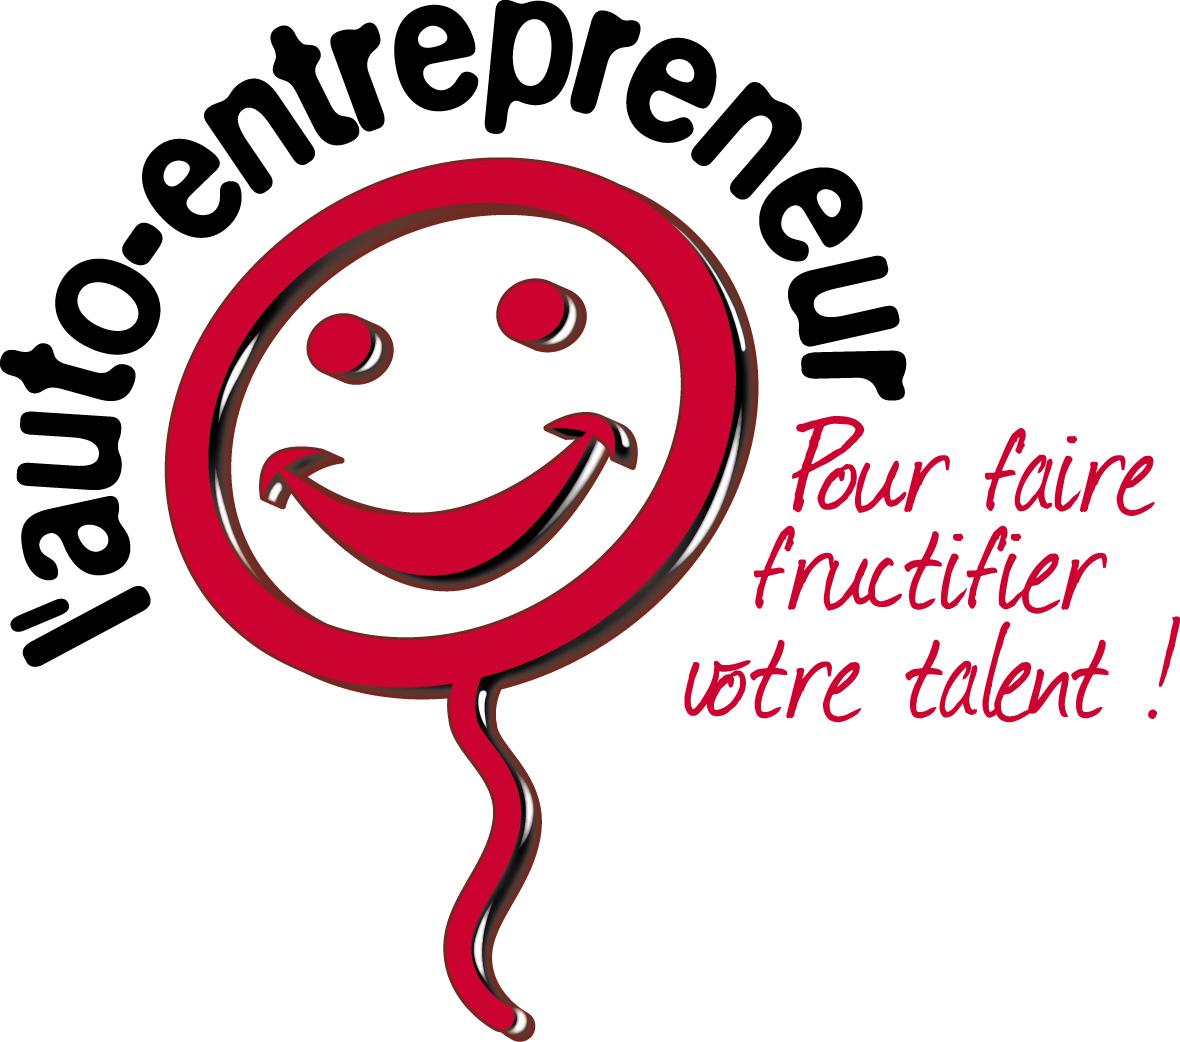 imagesauto-entrepreneur-1.jpg